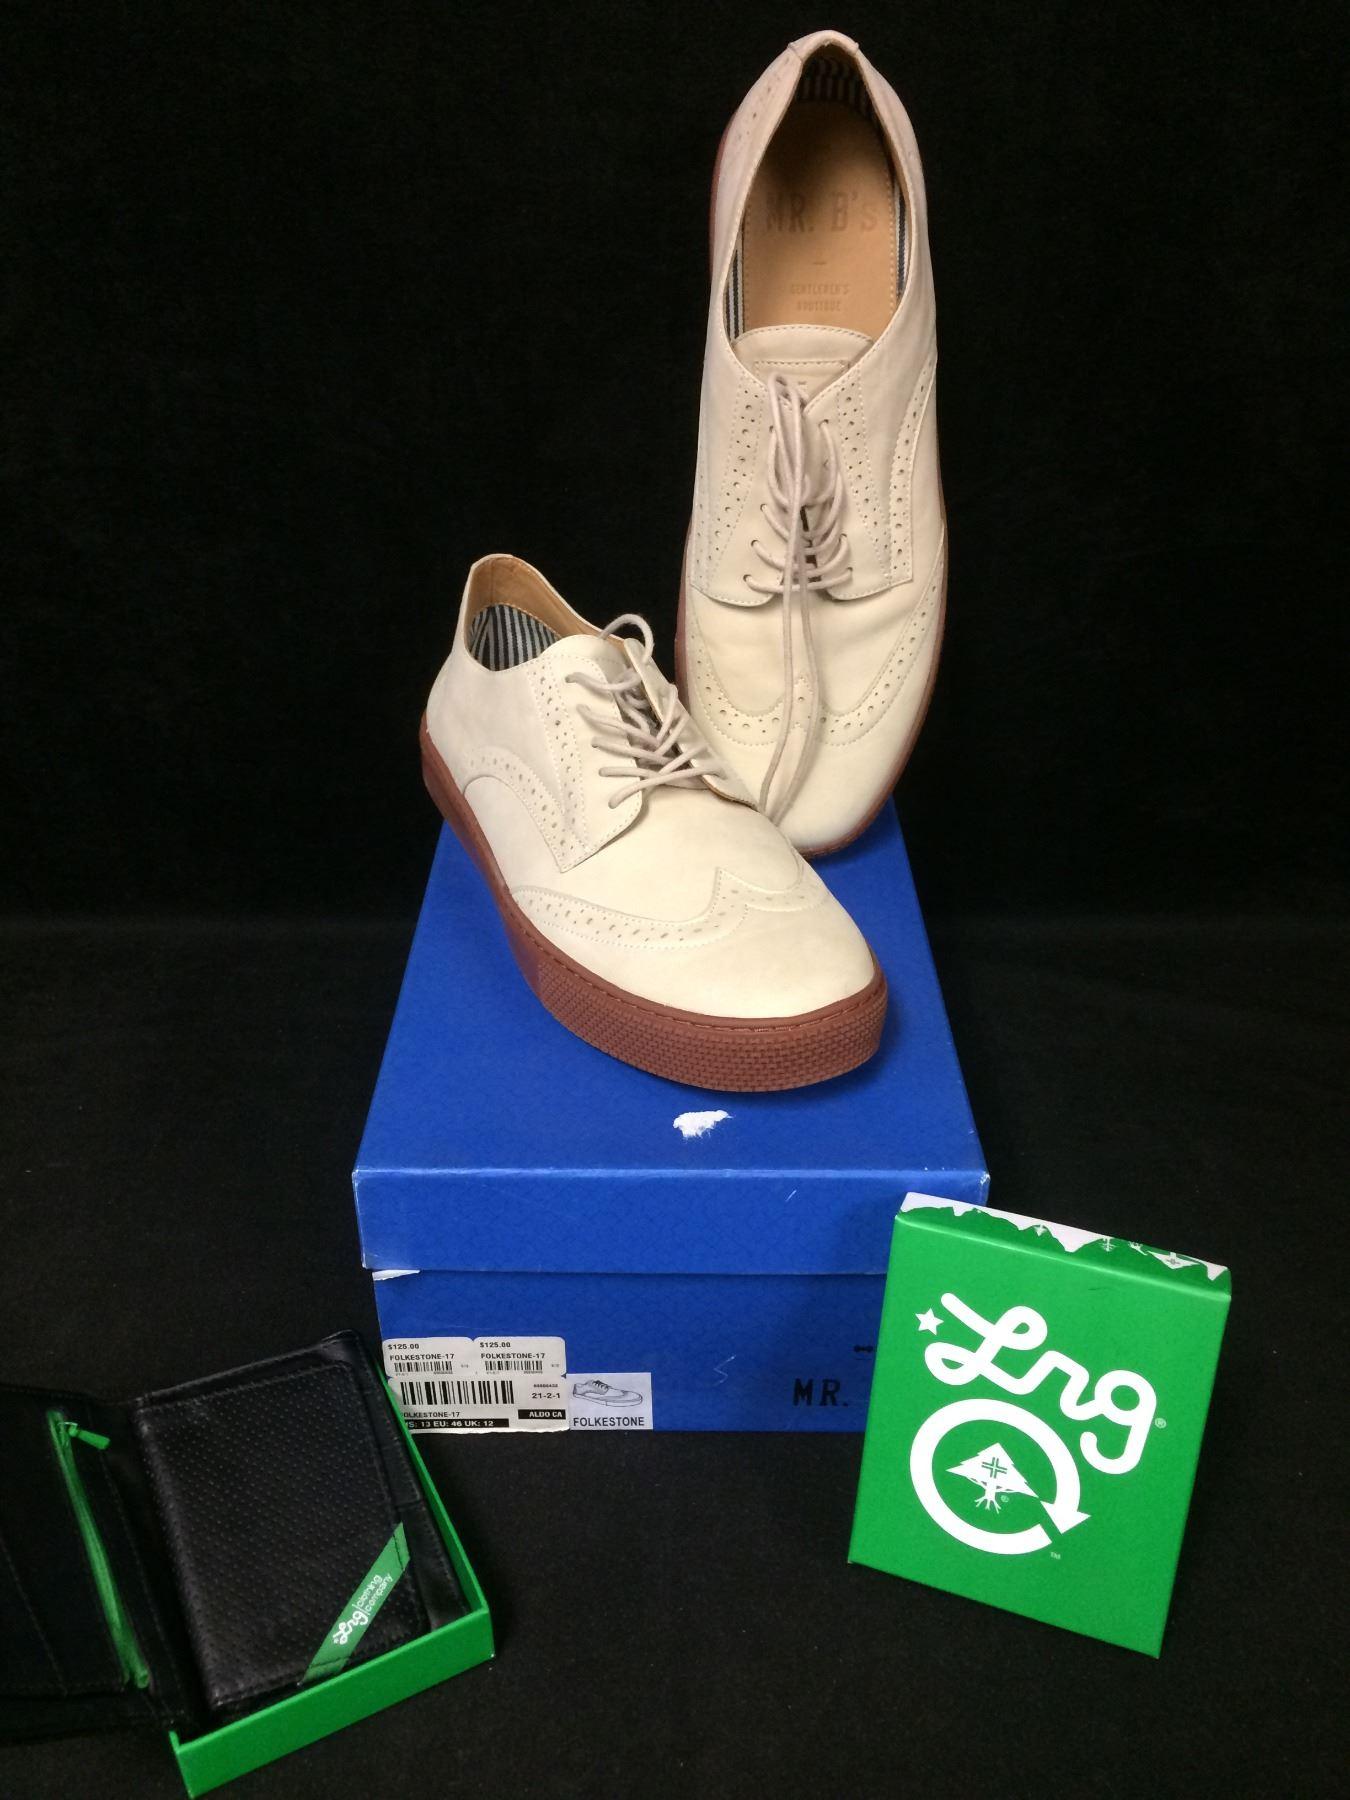 0af3f4c6ca Image 1 : NEW IN BOX Mr B's FOR ALDO MENS NATURAL FOLKESTONE REG $125 SIZE  ...